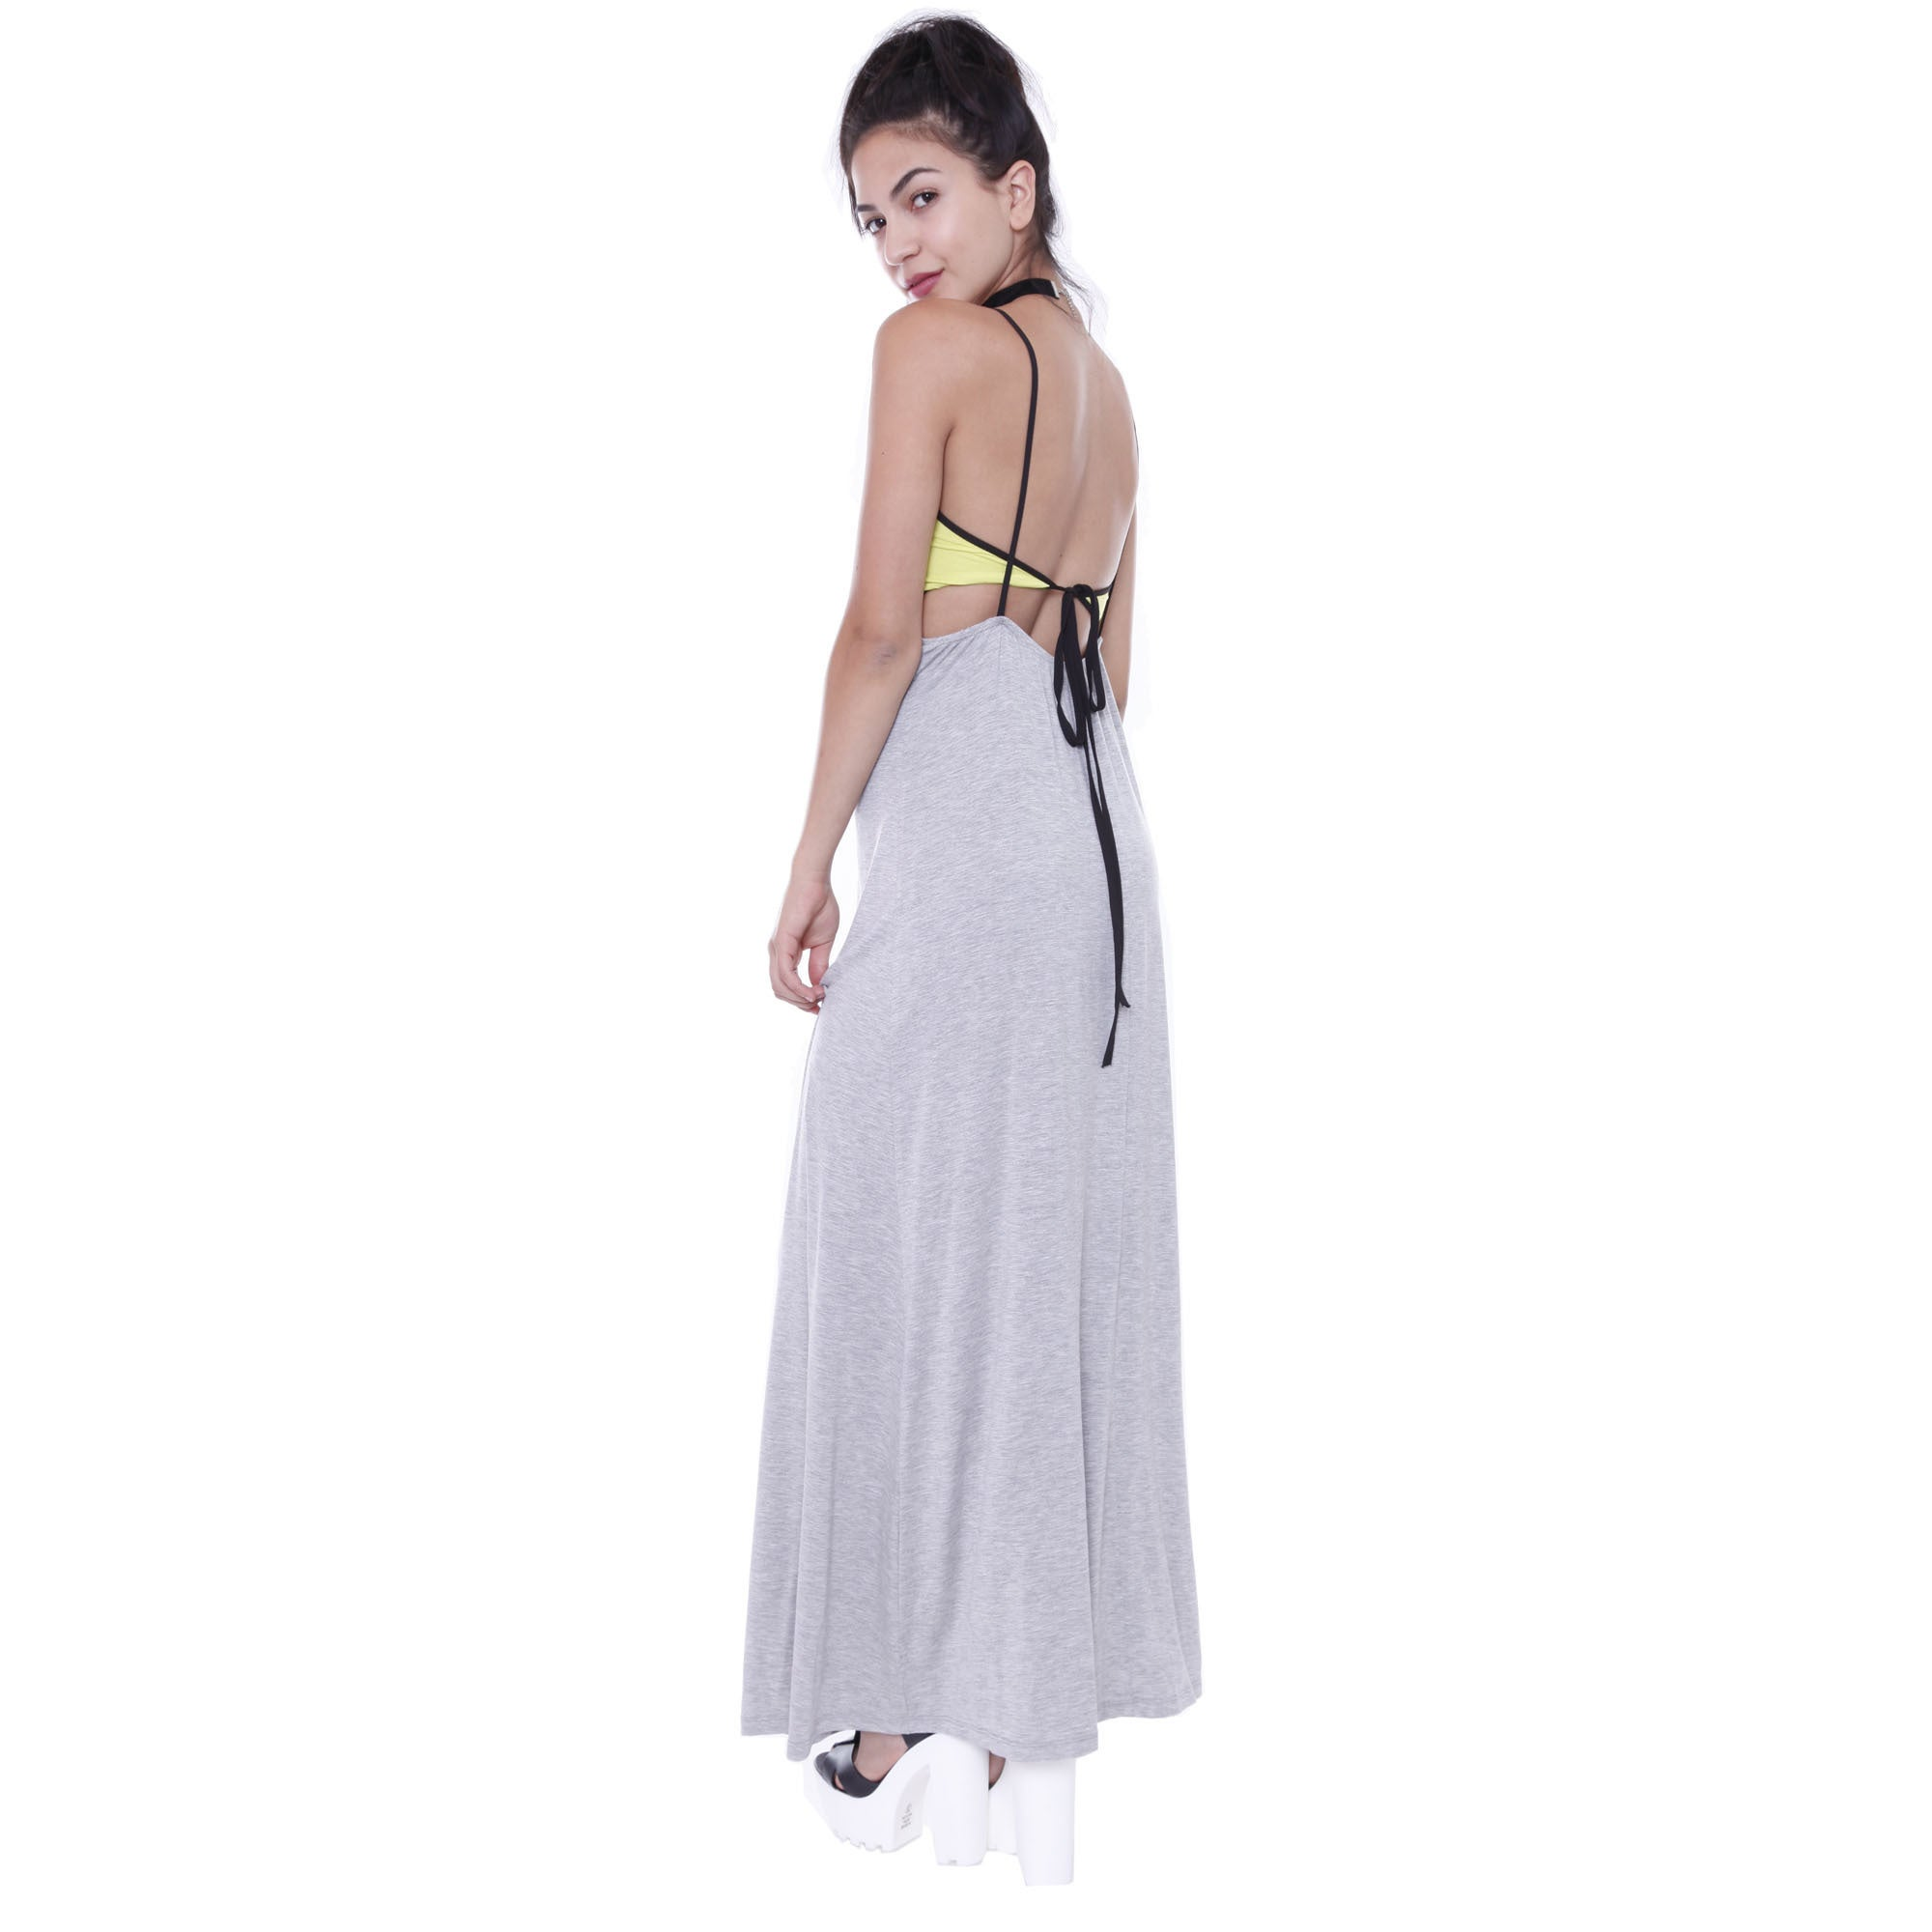 503301b007 Juniors Maxi Dresses Target